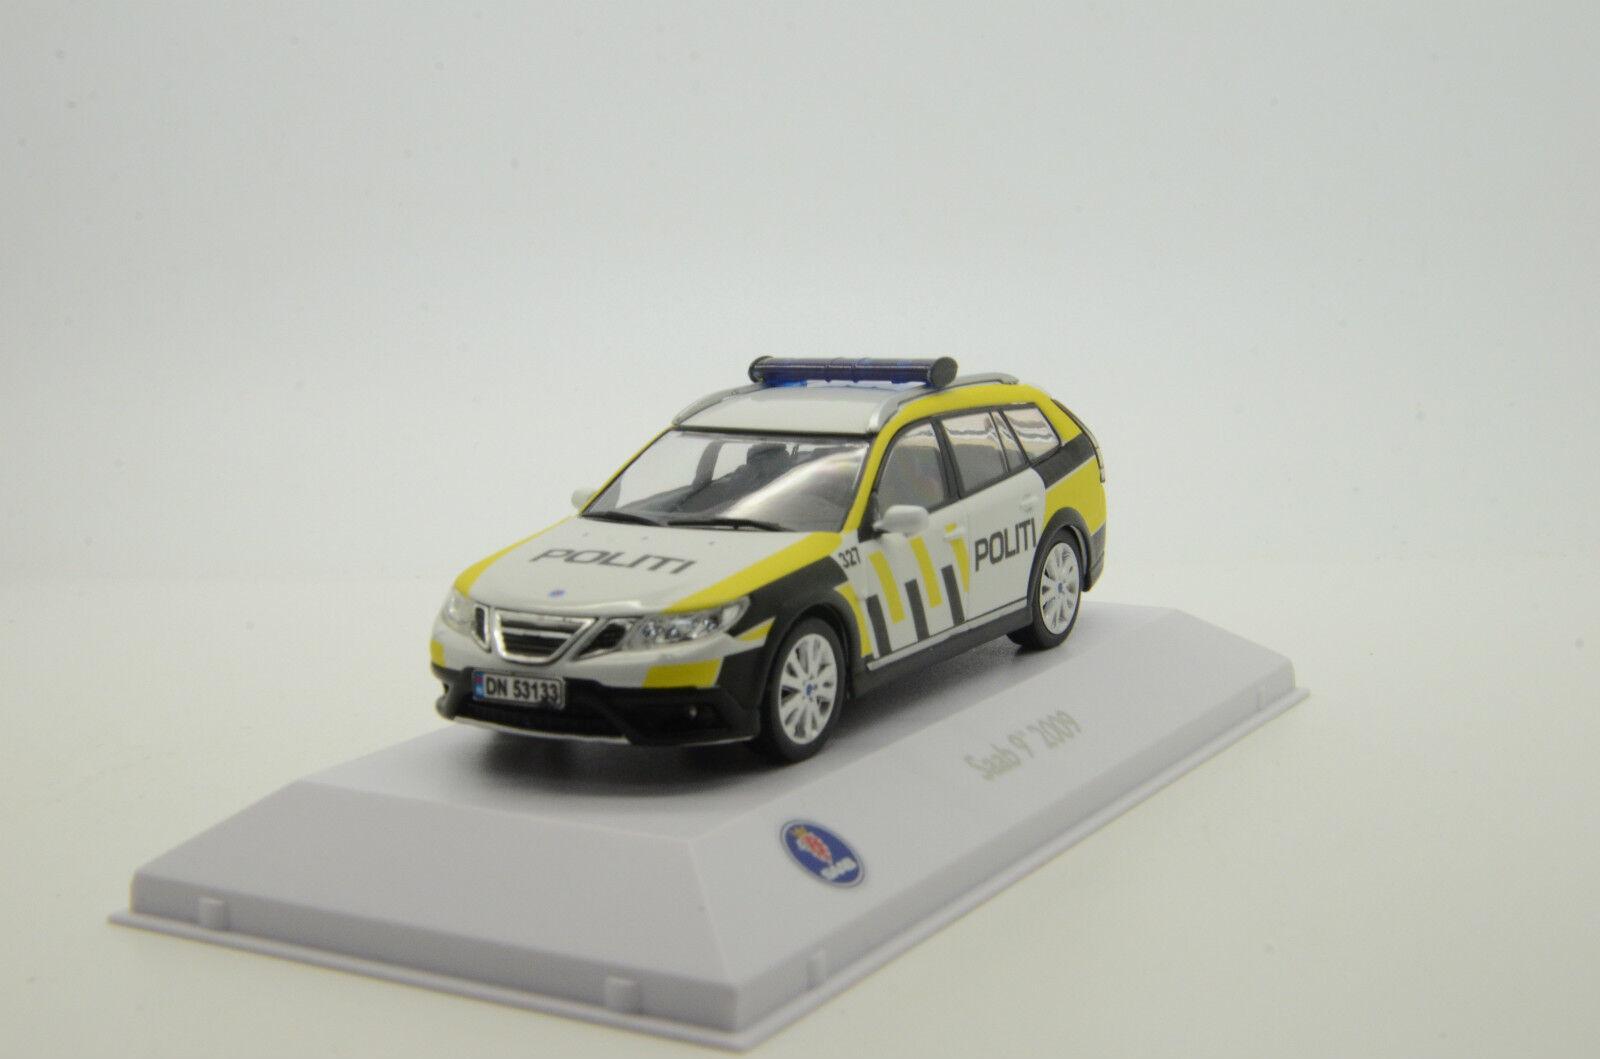 RARE  Saab 9-3x 2009 NEW Norway Politi Police Custom Made 1/43